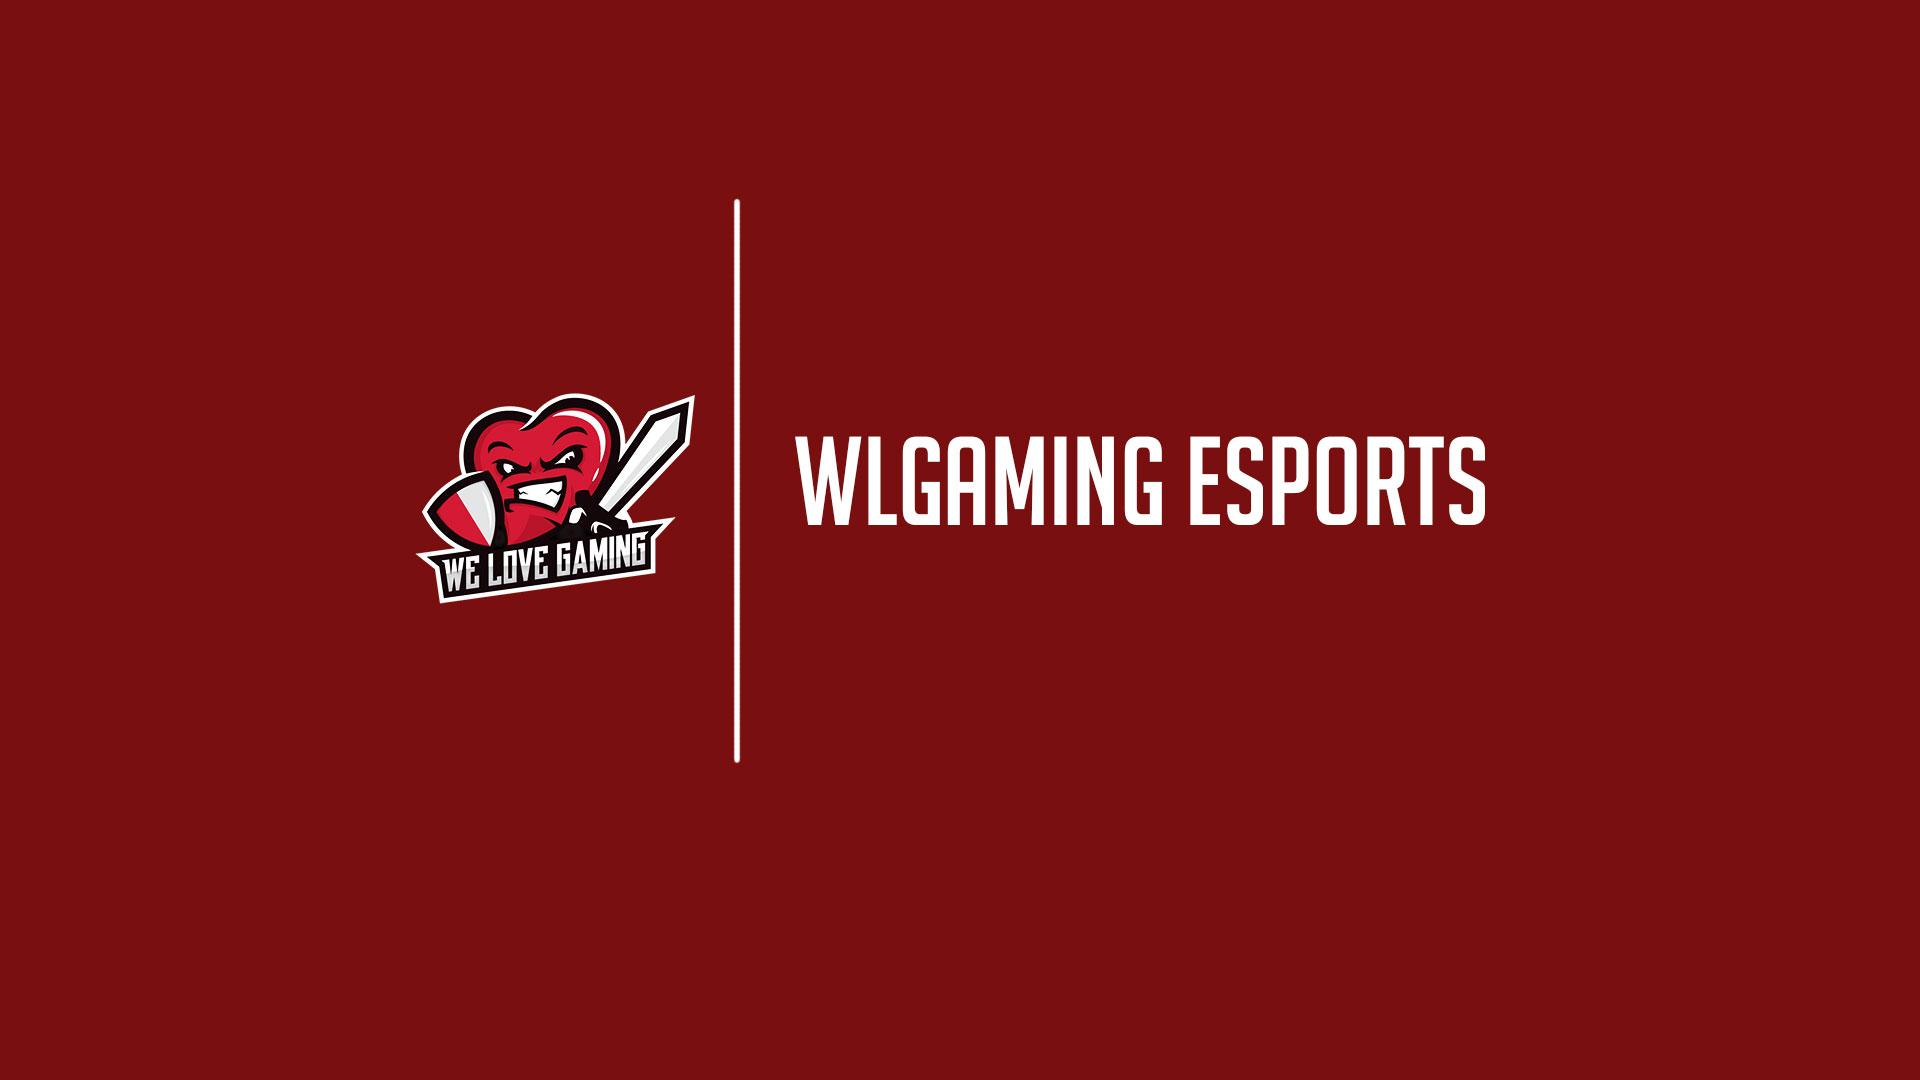 WLG PUBG Team - Η Πορεία τους μέχρι τώρα